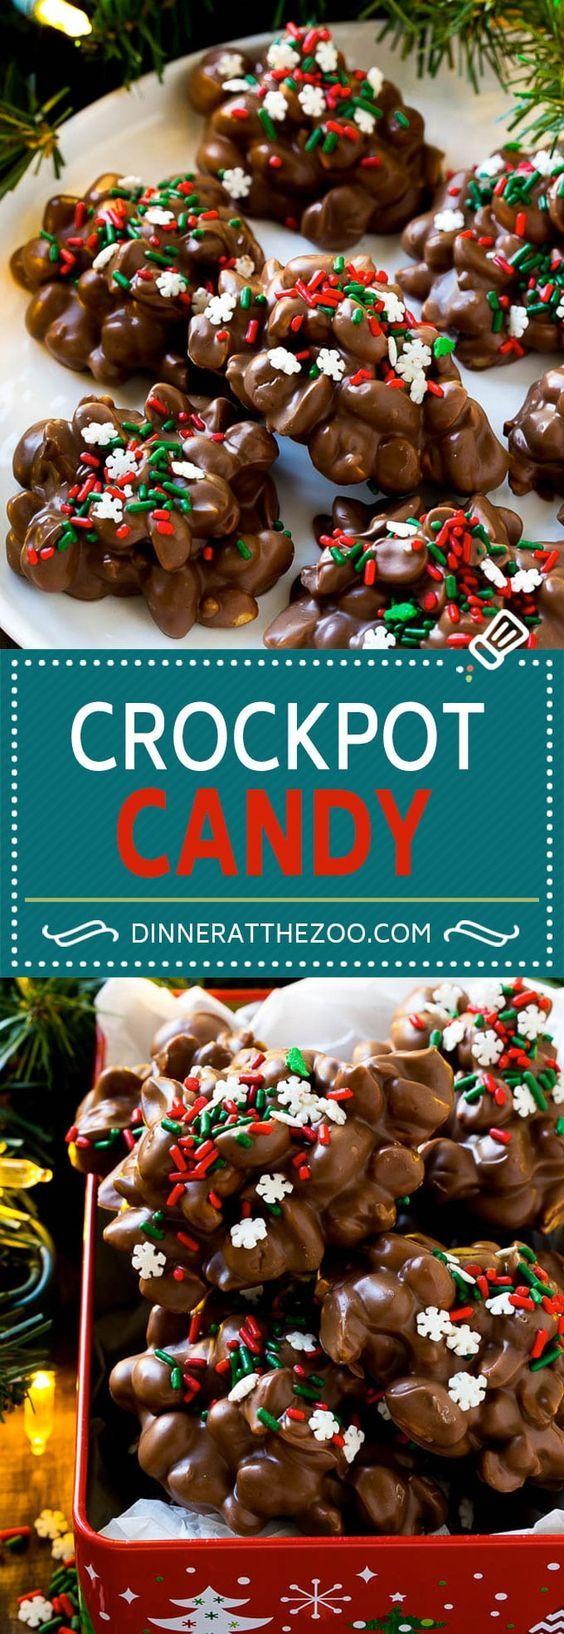 Crockpot Candy | Slow Cooker Candy | Crockpot Peanut Clusters ...